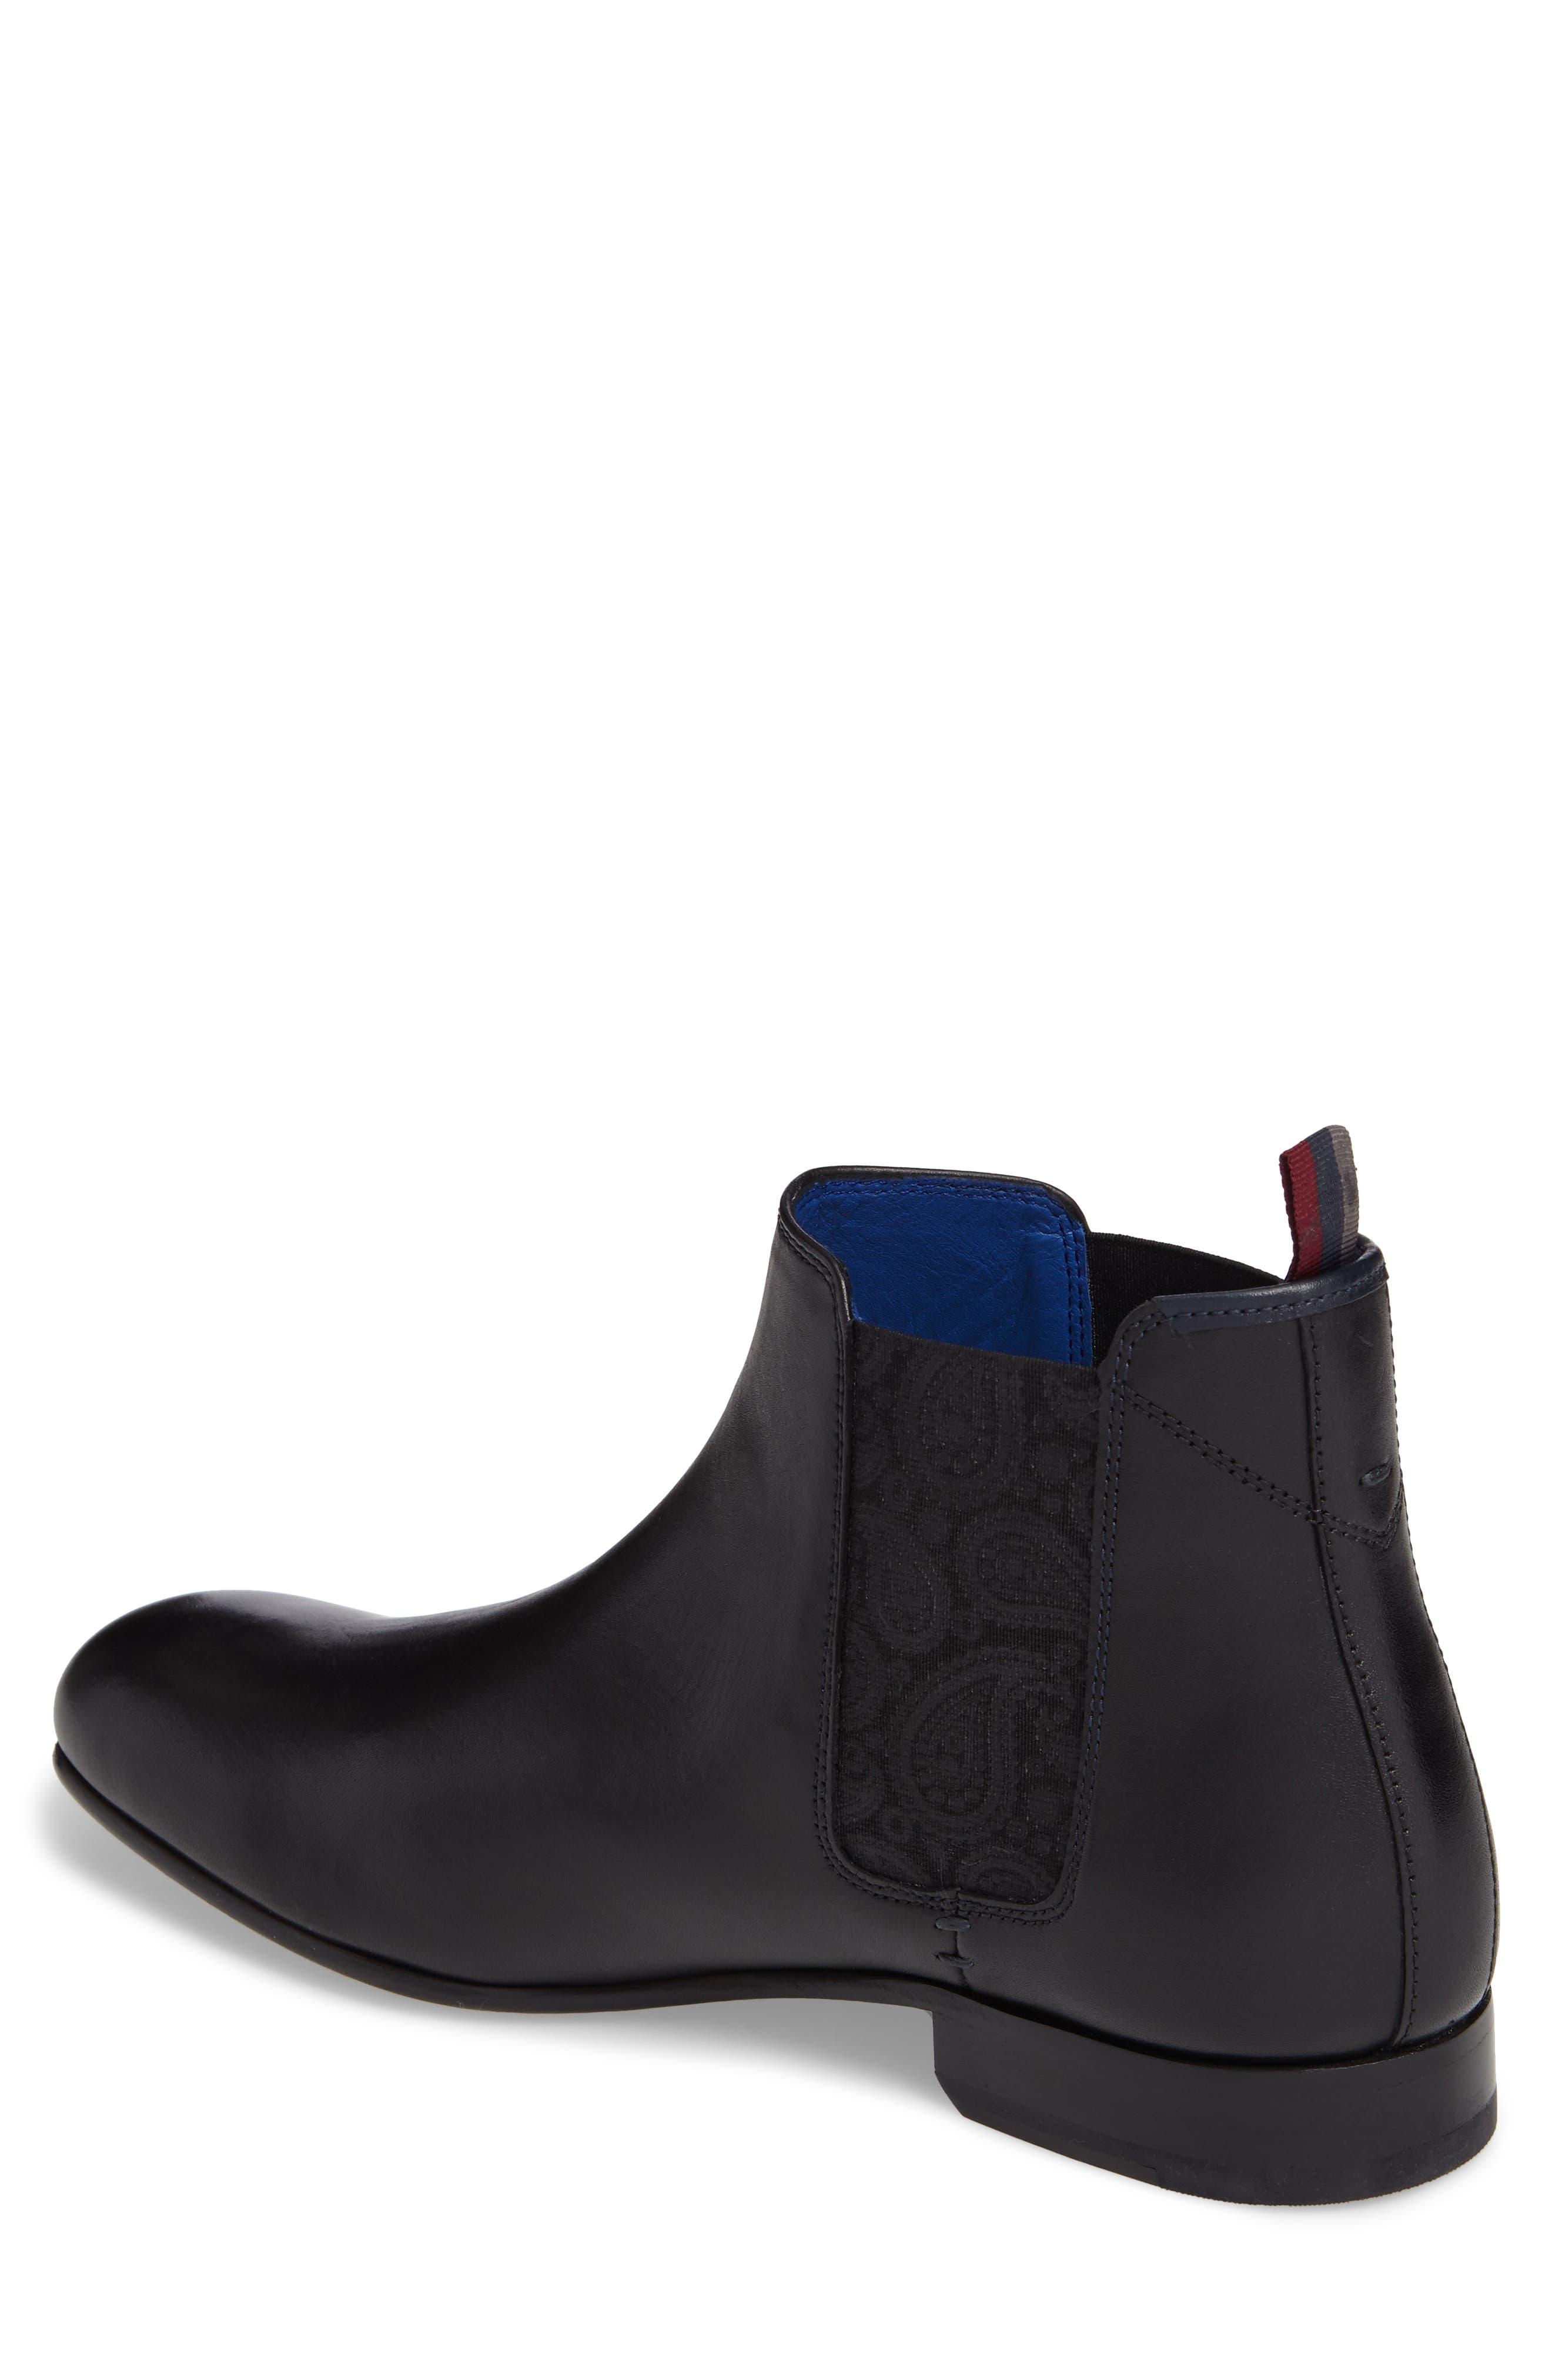 Kayto Chelsea Boot,                             Alternate thumbnail 2, color,                             Black Leather